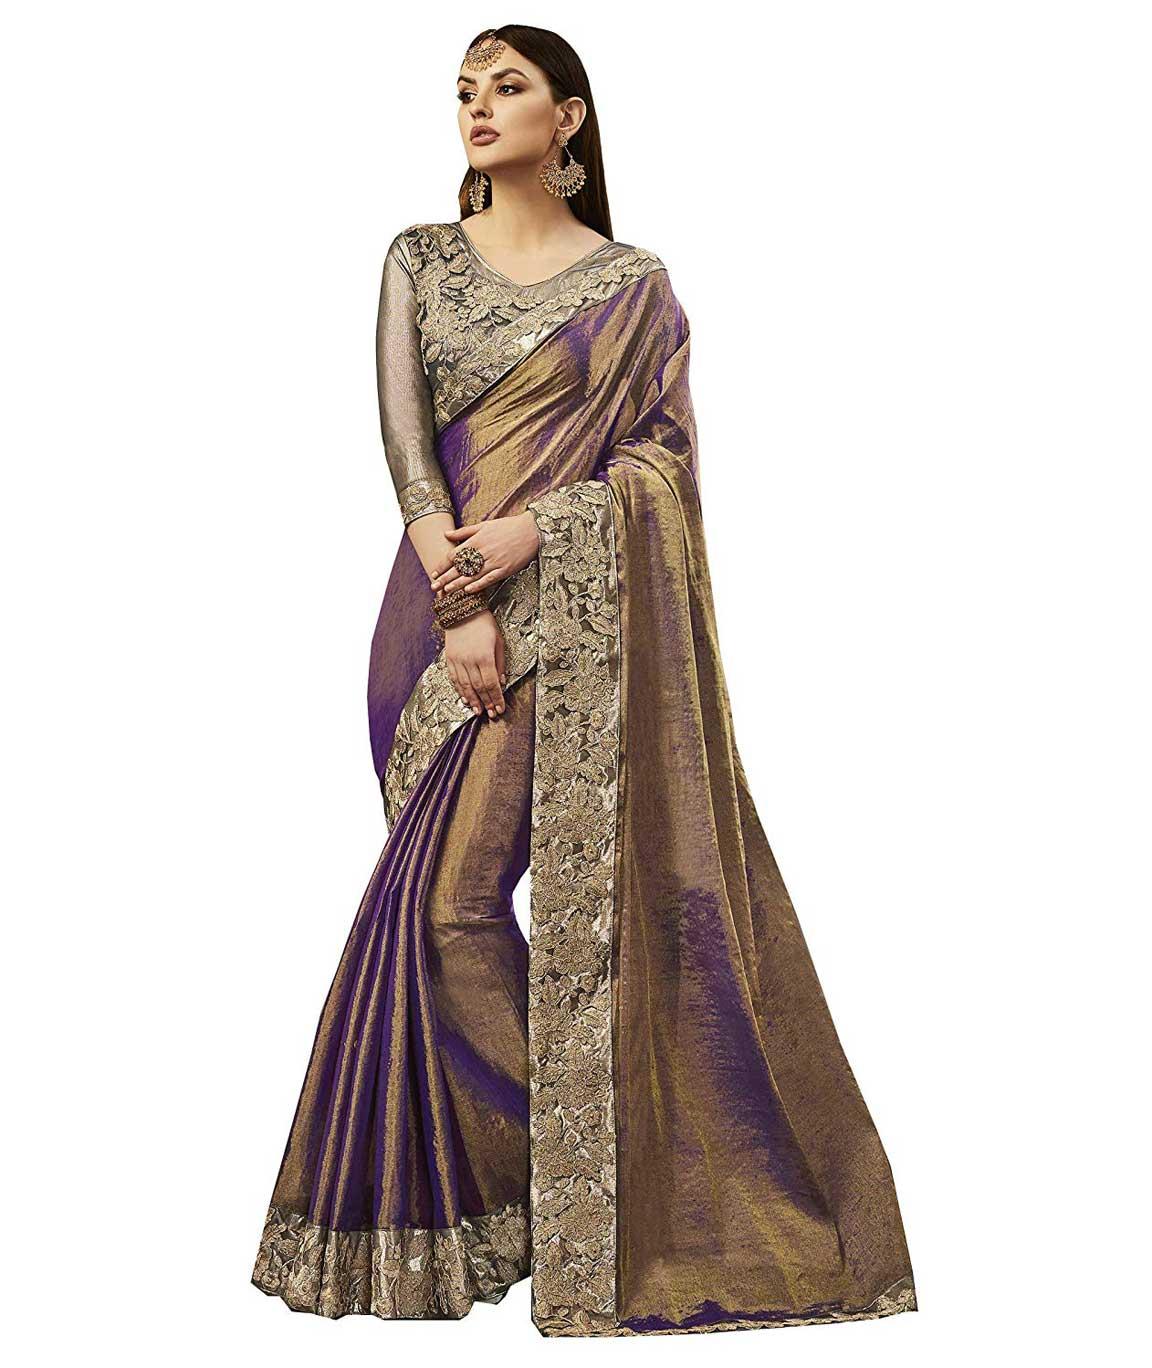 Shangrila Designer Purple Color Embellished Lace Work Silk Saree With Unstitched Blouse (Purple)